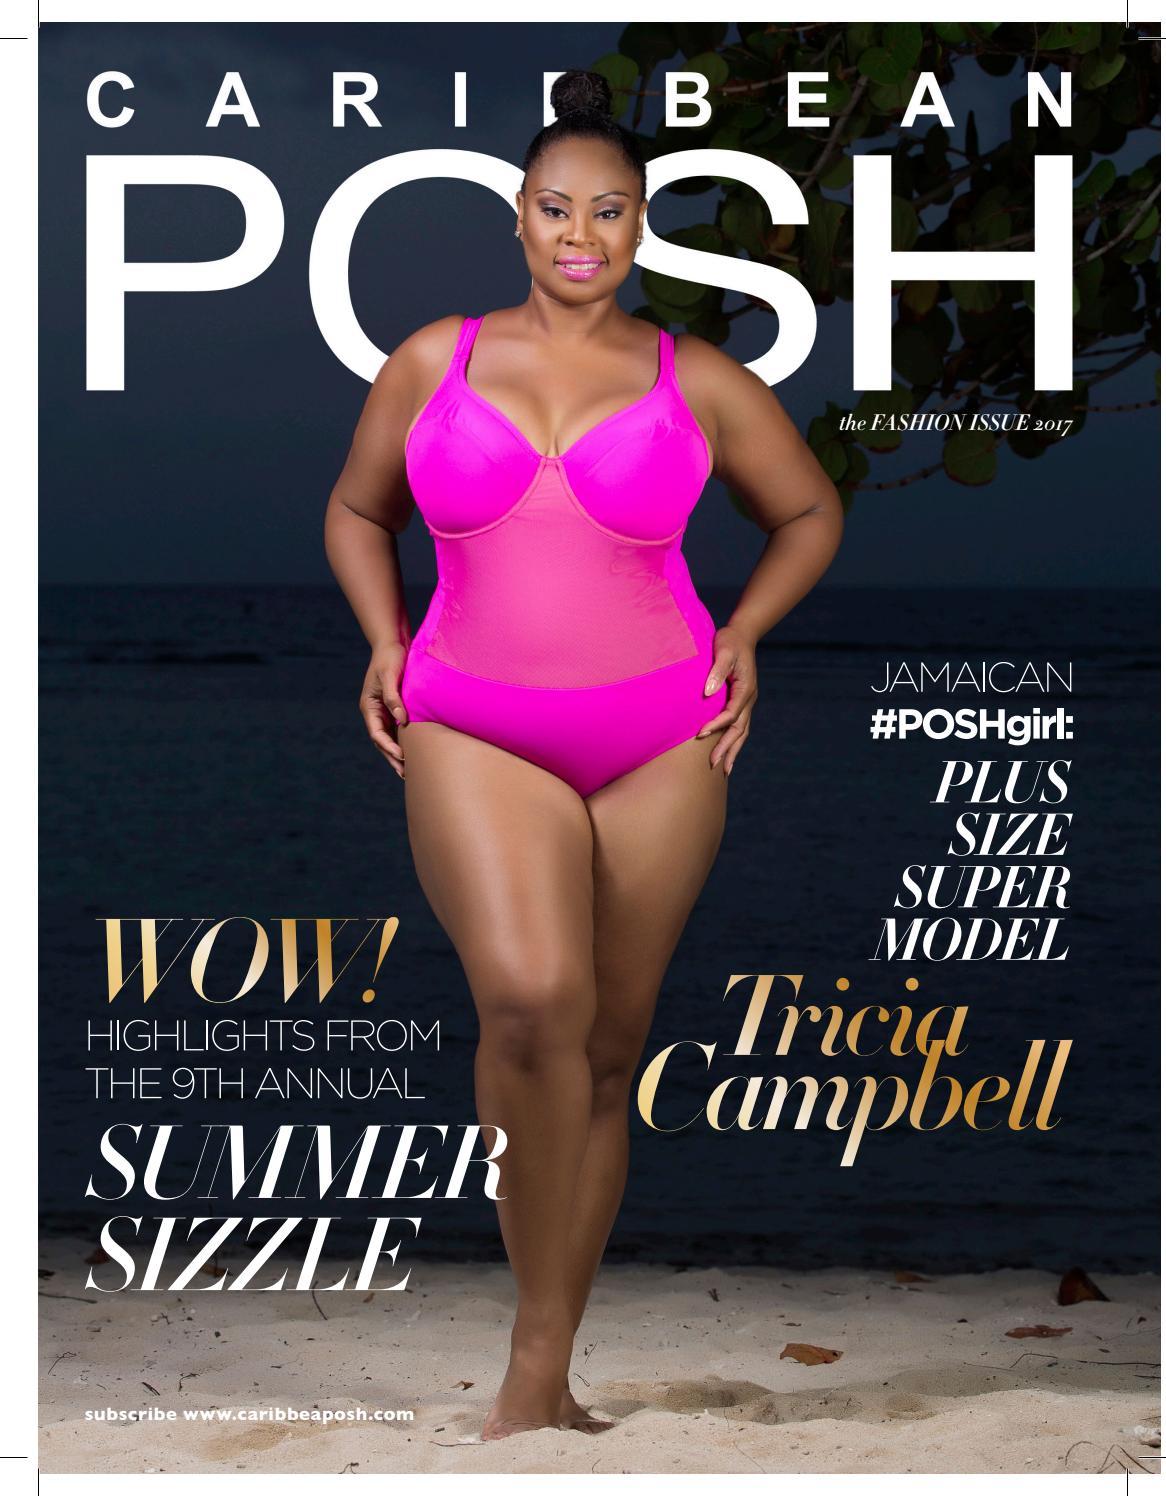 9bb17d1fad899 Caribbean POSH Fashion Issue - Tricia Campbell Cover by Caribbean POSH -  issuu